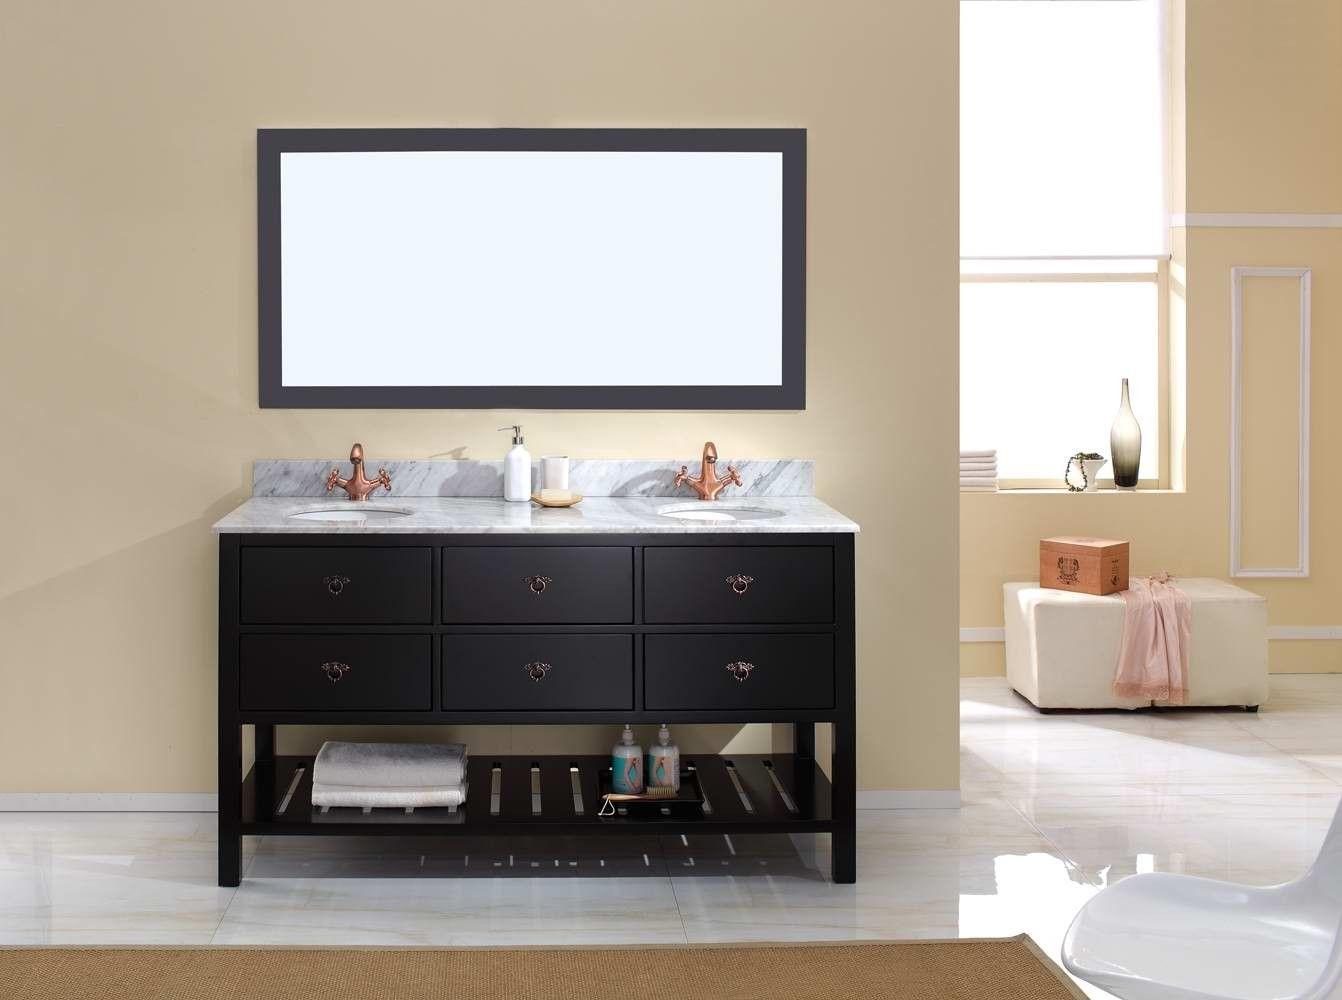 Salerno Black Ebony Bathroom Vanity Traditional Free Standing Double Vanity Cabinet Vanity Vanity Cabinet Wall